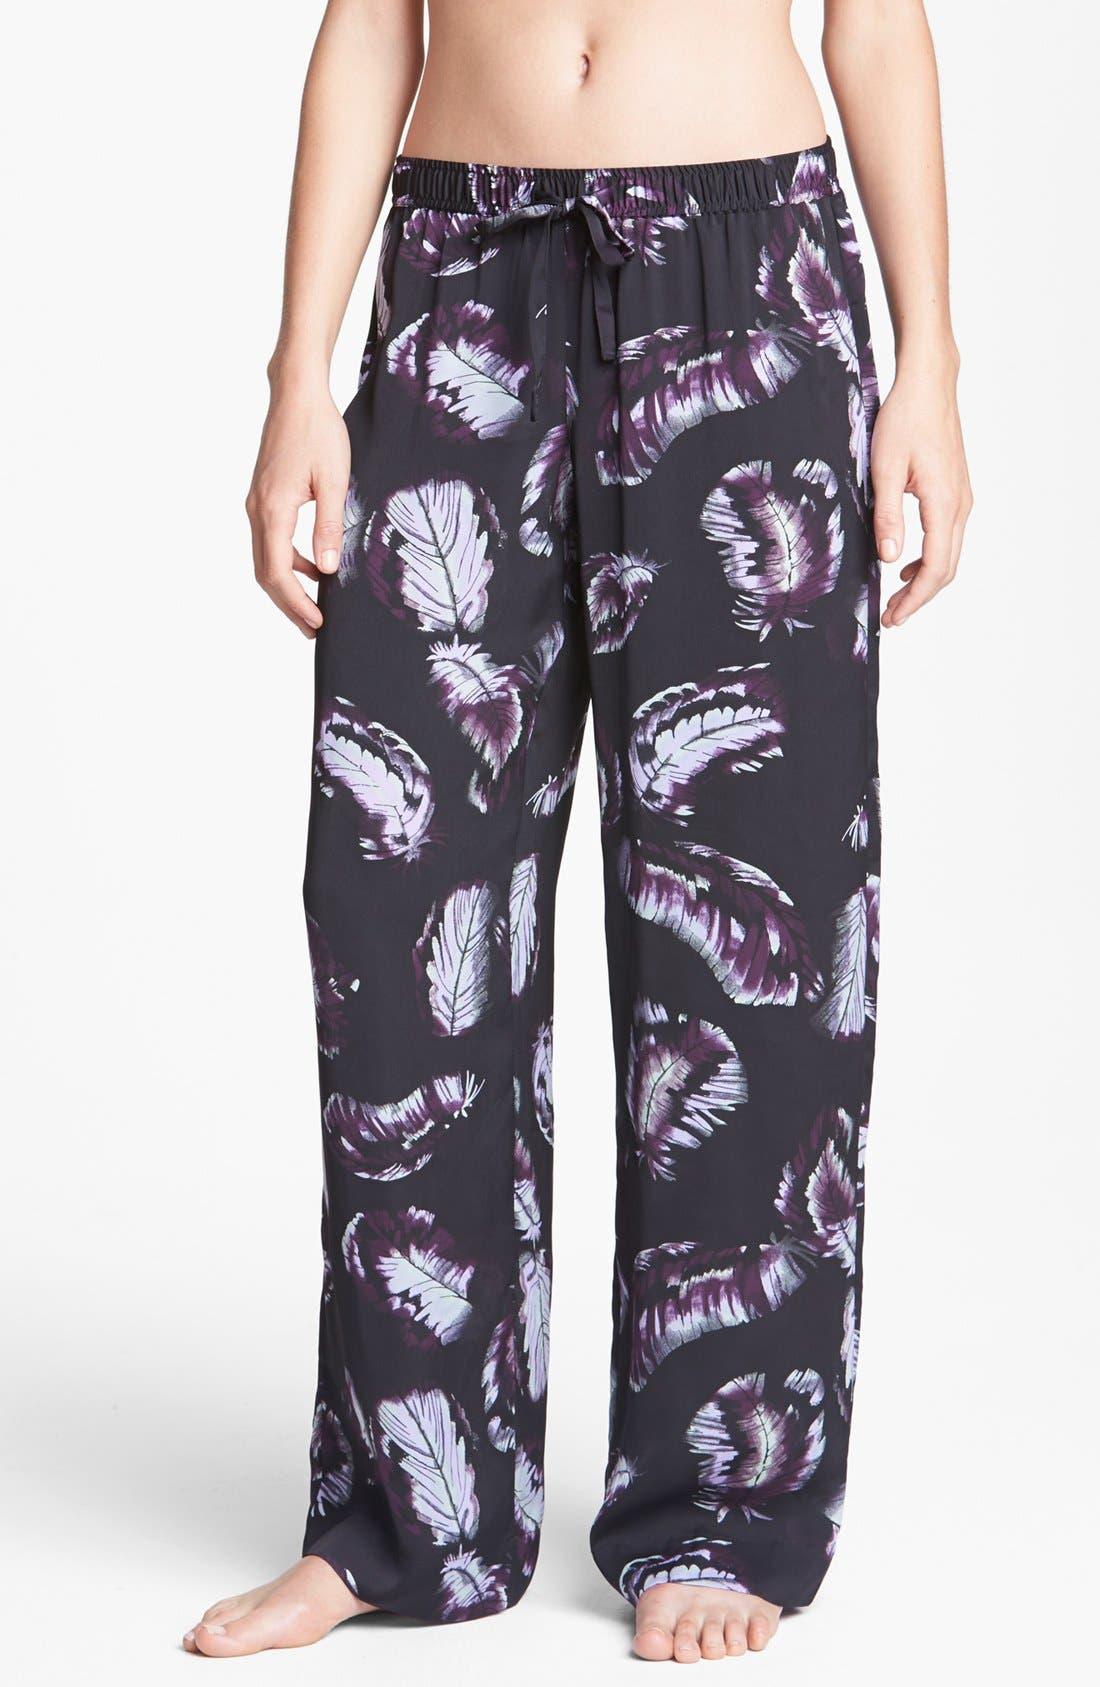 Alternate Image 1 Selected - Shimera Silky Woven Lounge Pants